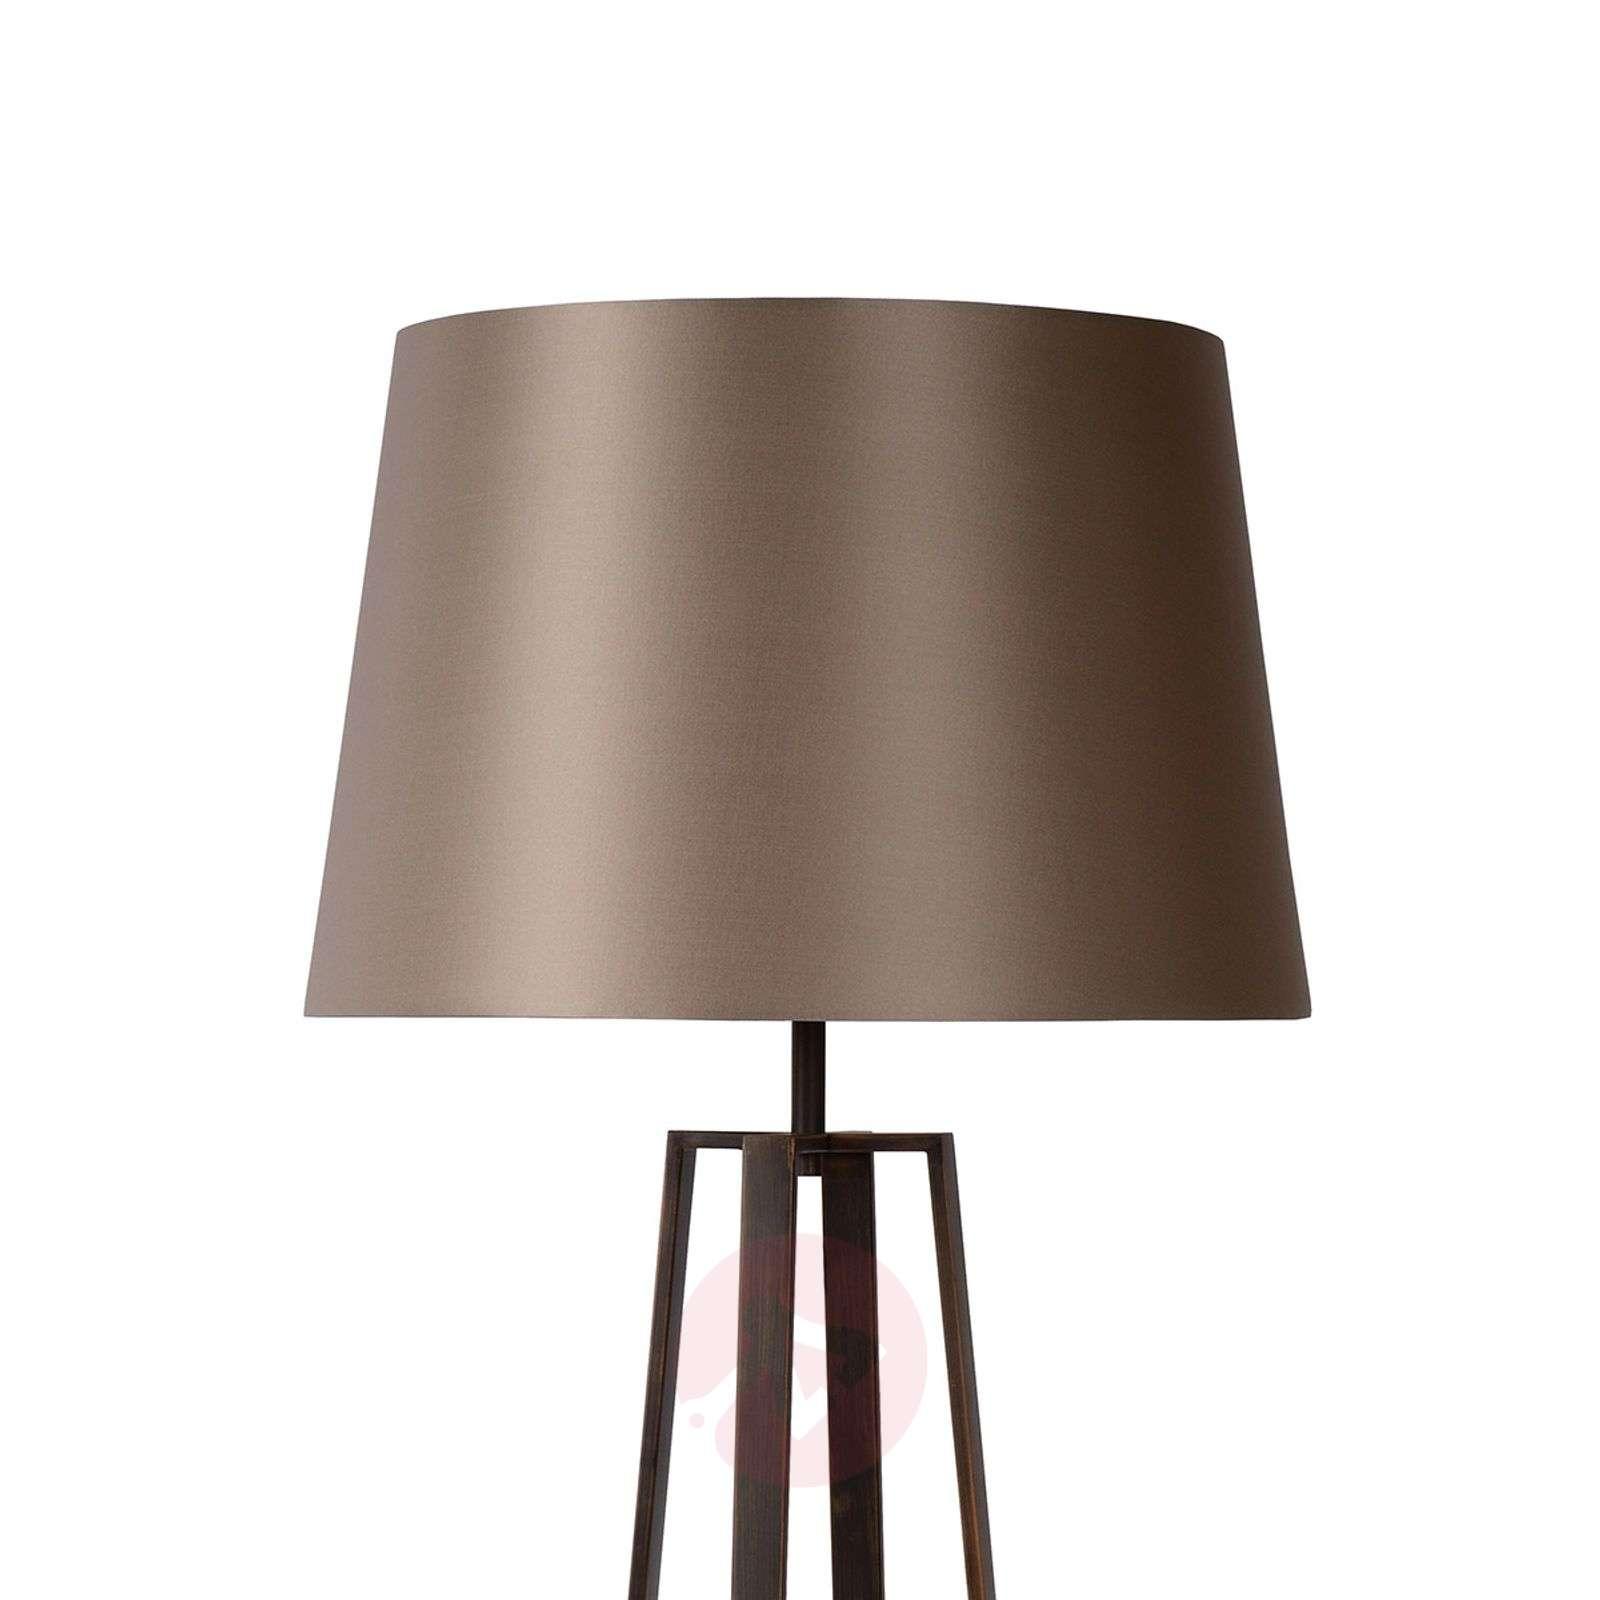 Rusty brown Coffee Lamp floor lamp, fabric shade-6054947-01